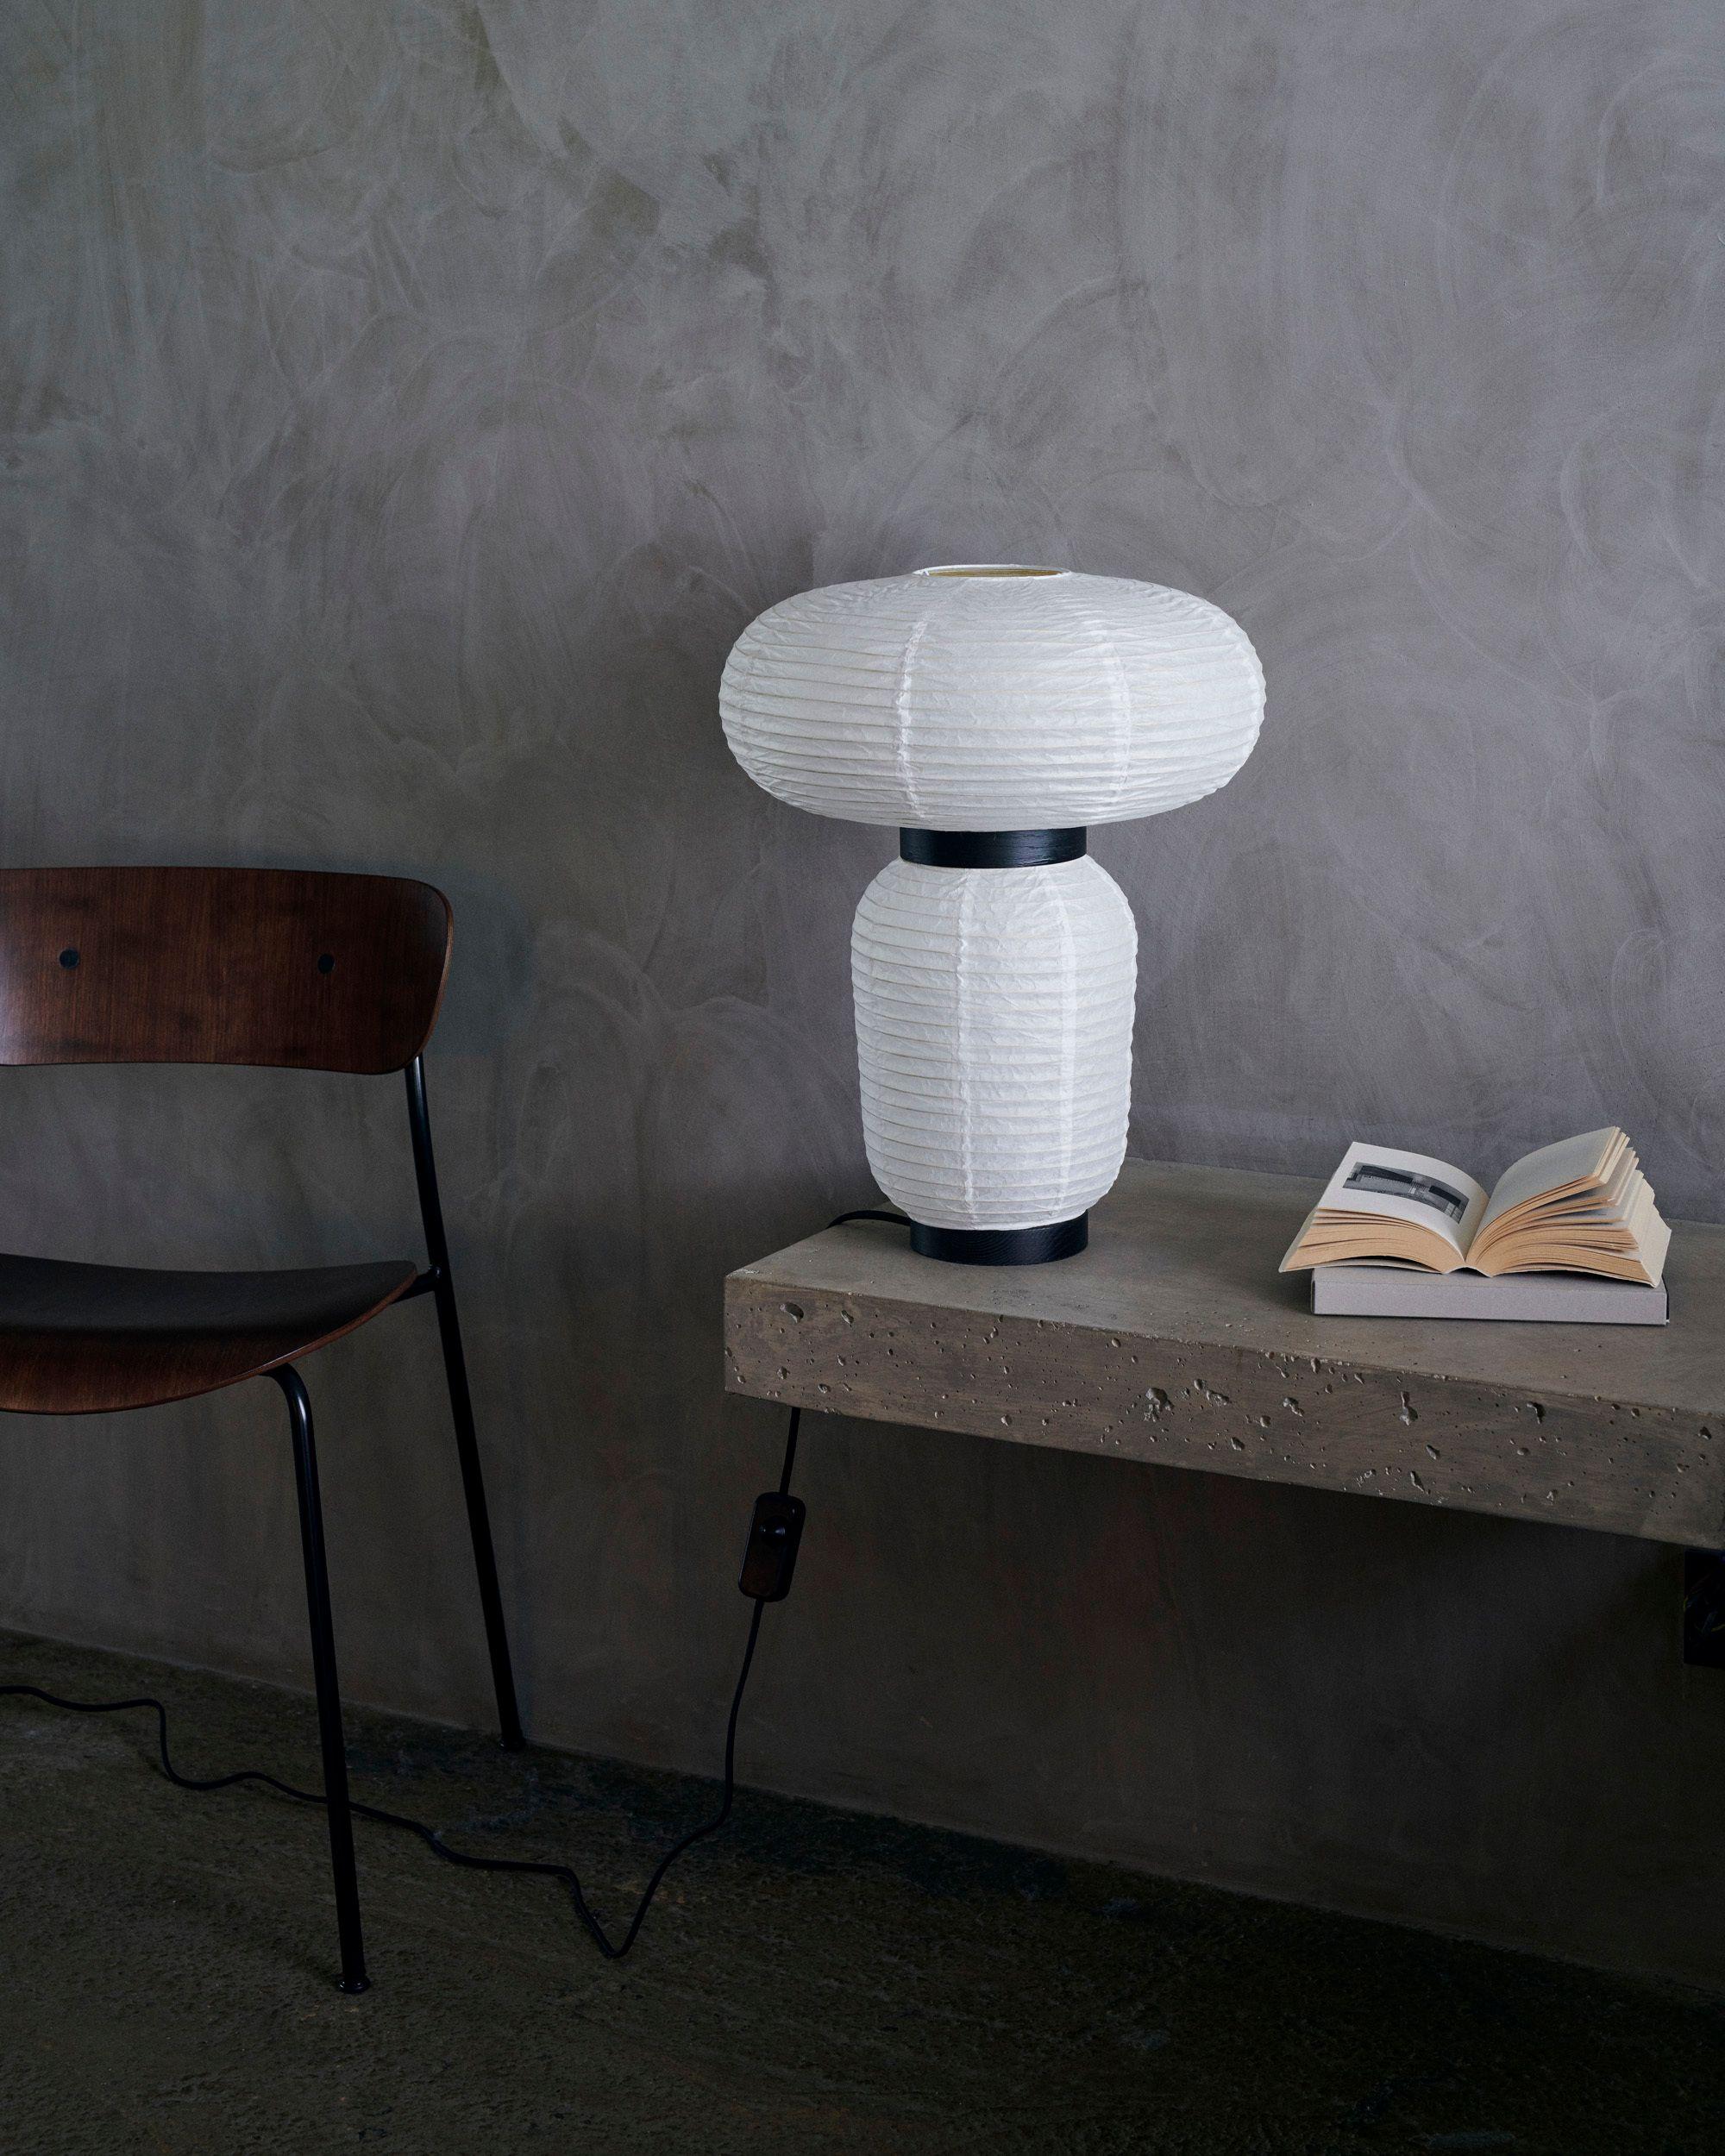 Jh18 Formakami Table Lamp In 2020 Table Lamp Lamp Asian Lamps